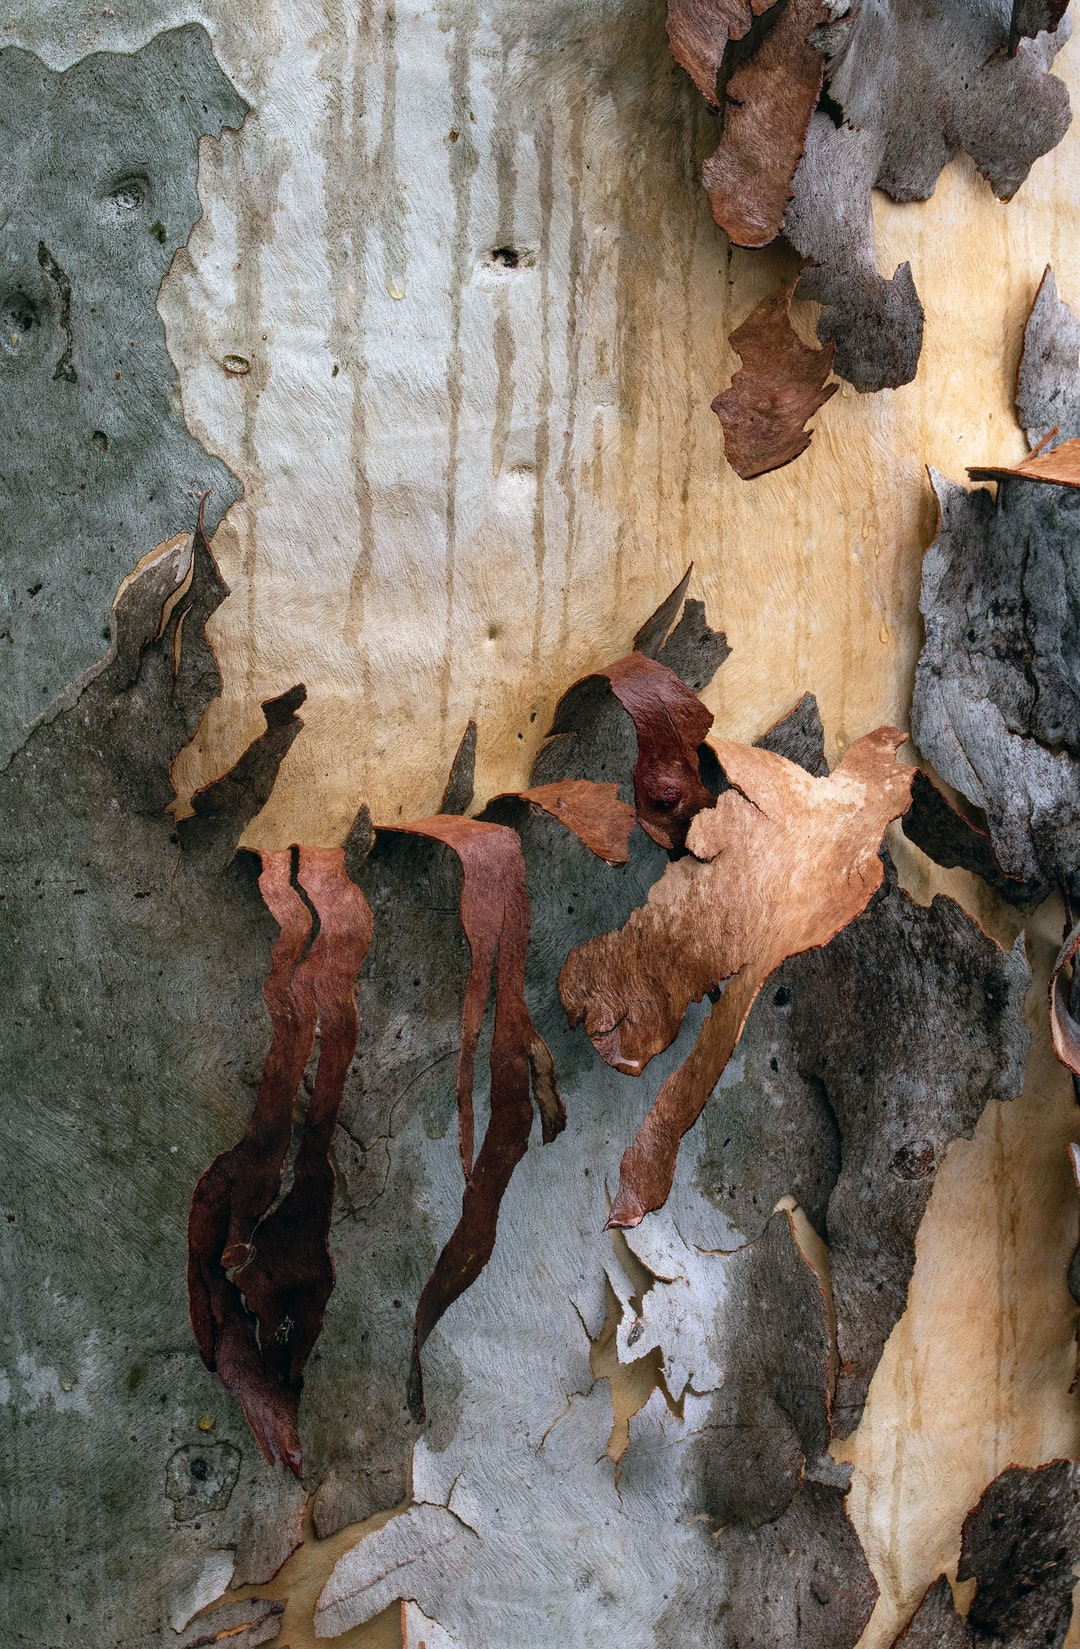 The bark of a Poplar gum Eucalyptus platyphylla photographed on a rainy day.